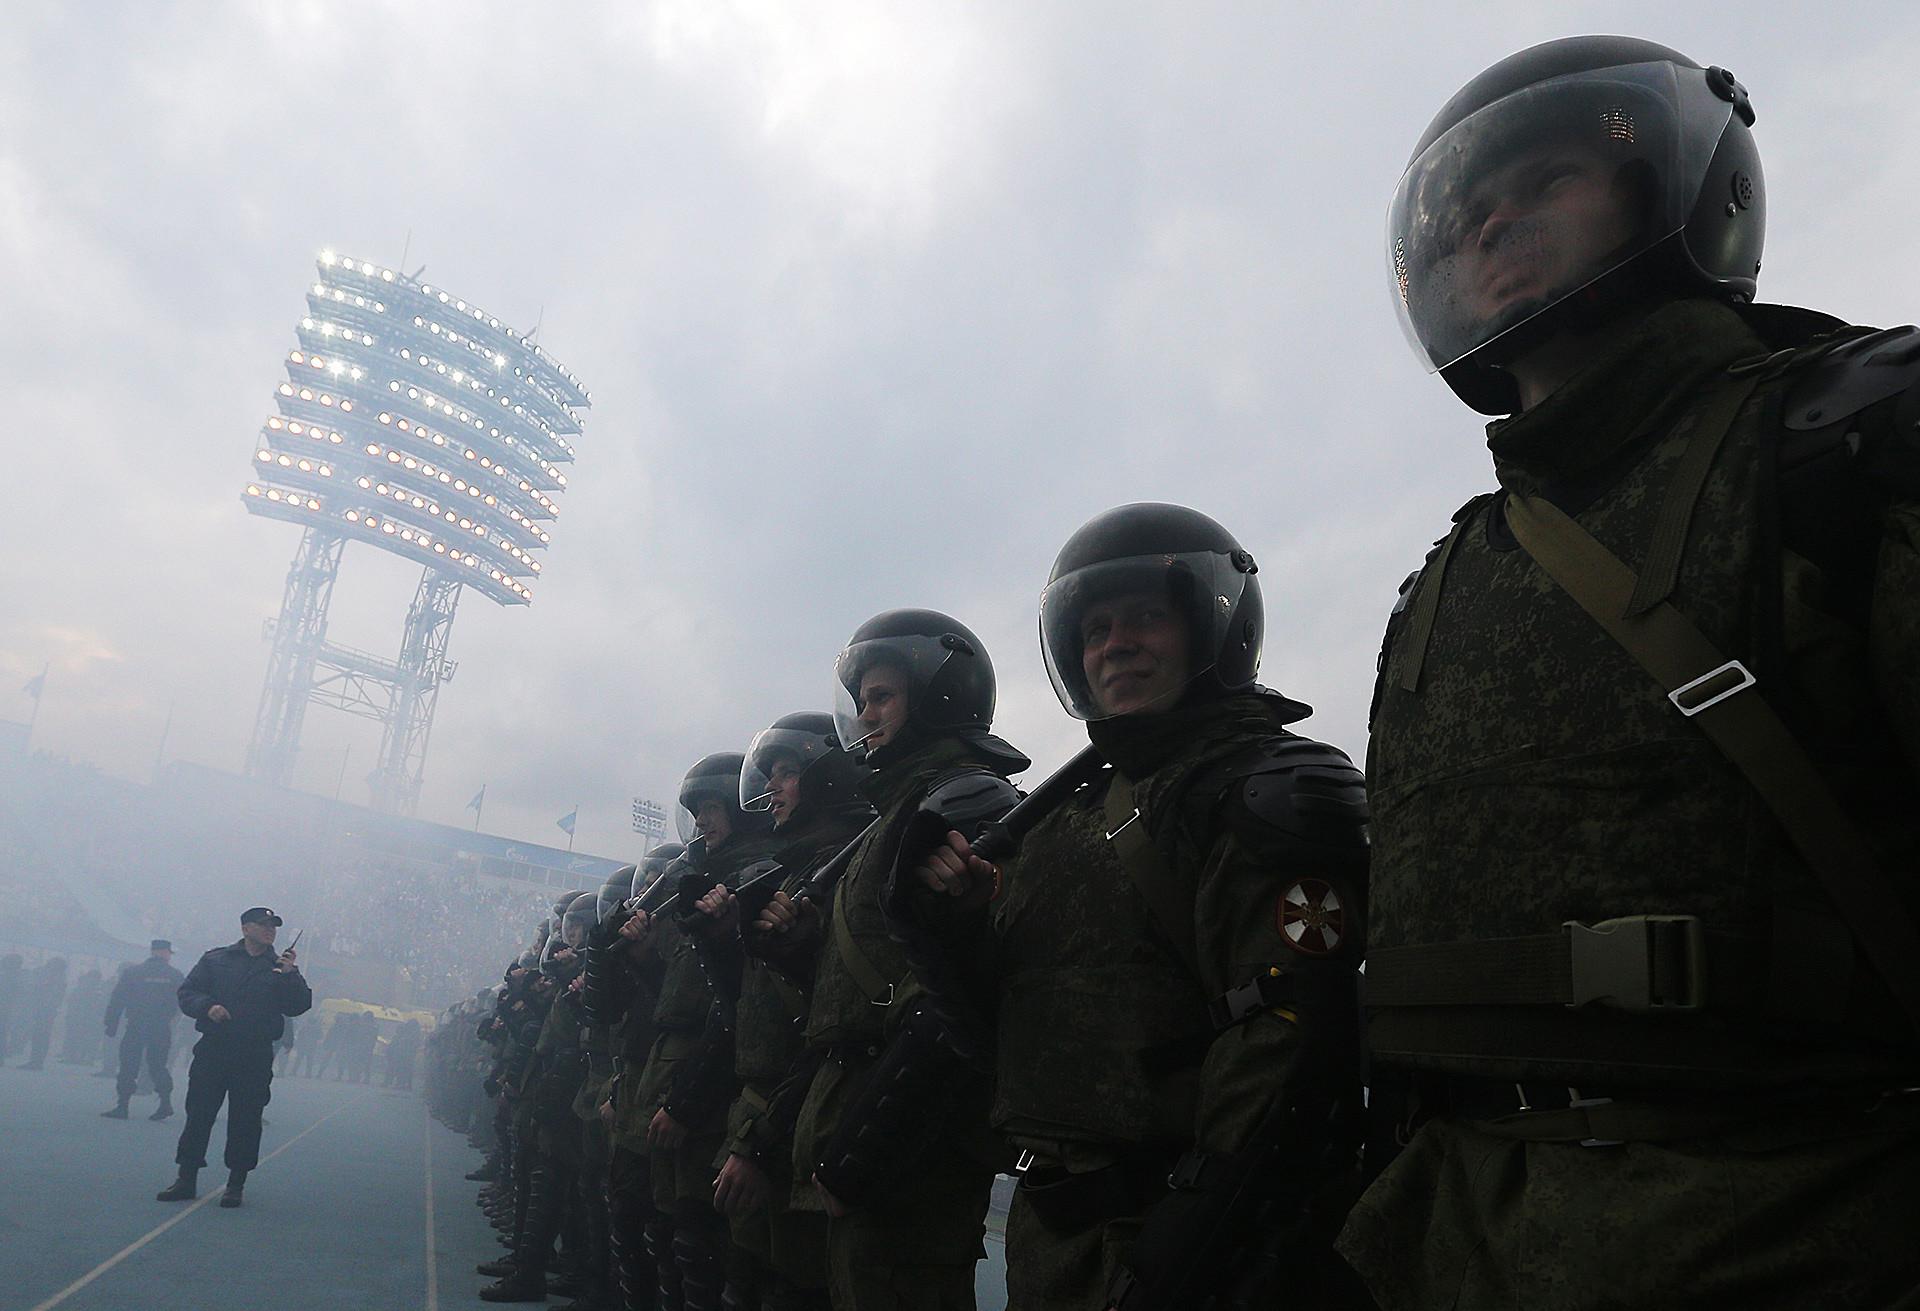 Policiais observam torcedores acendendo sinalizadores durante o Campeonato Russo.